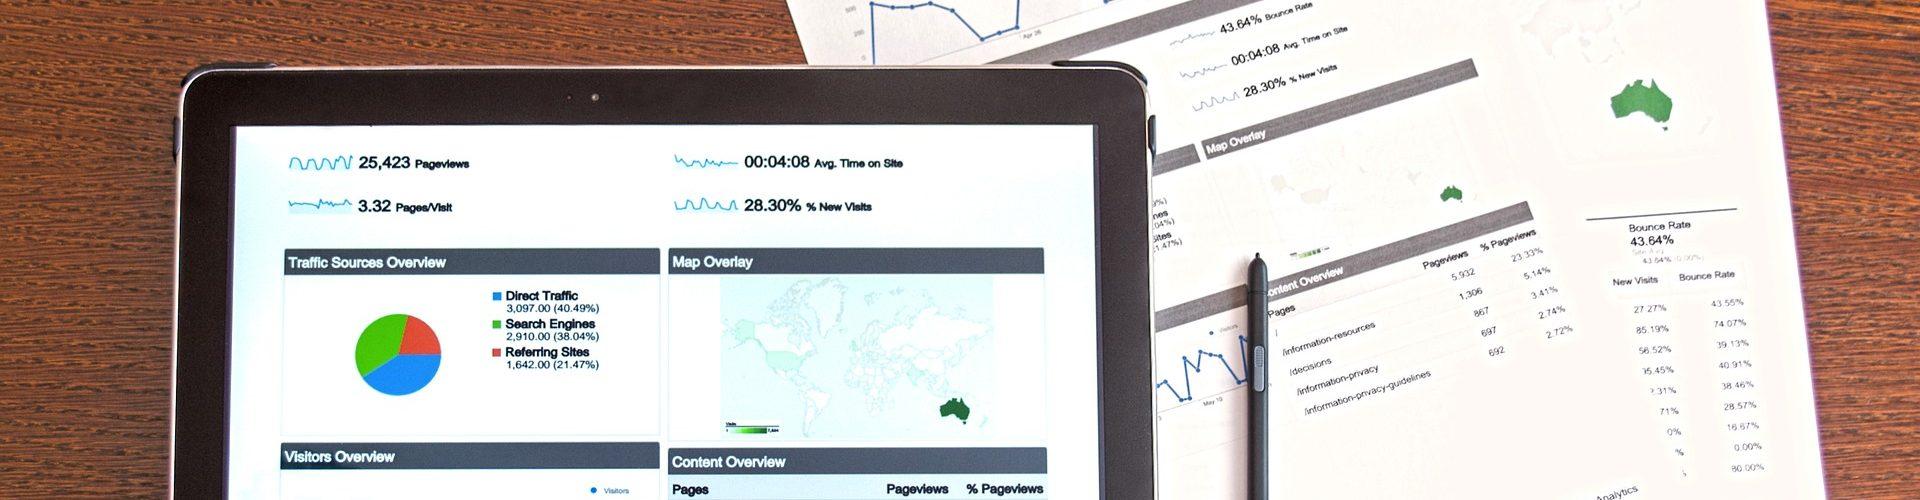 People Analytics - O RH Data Driven